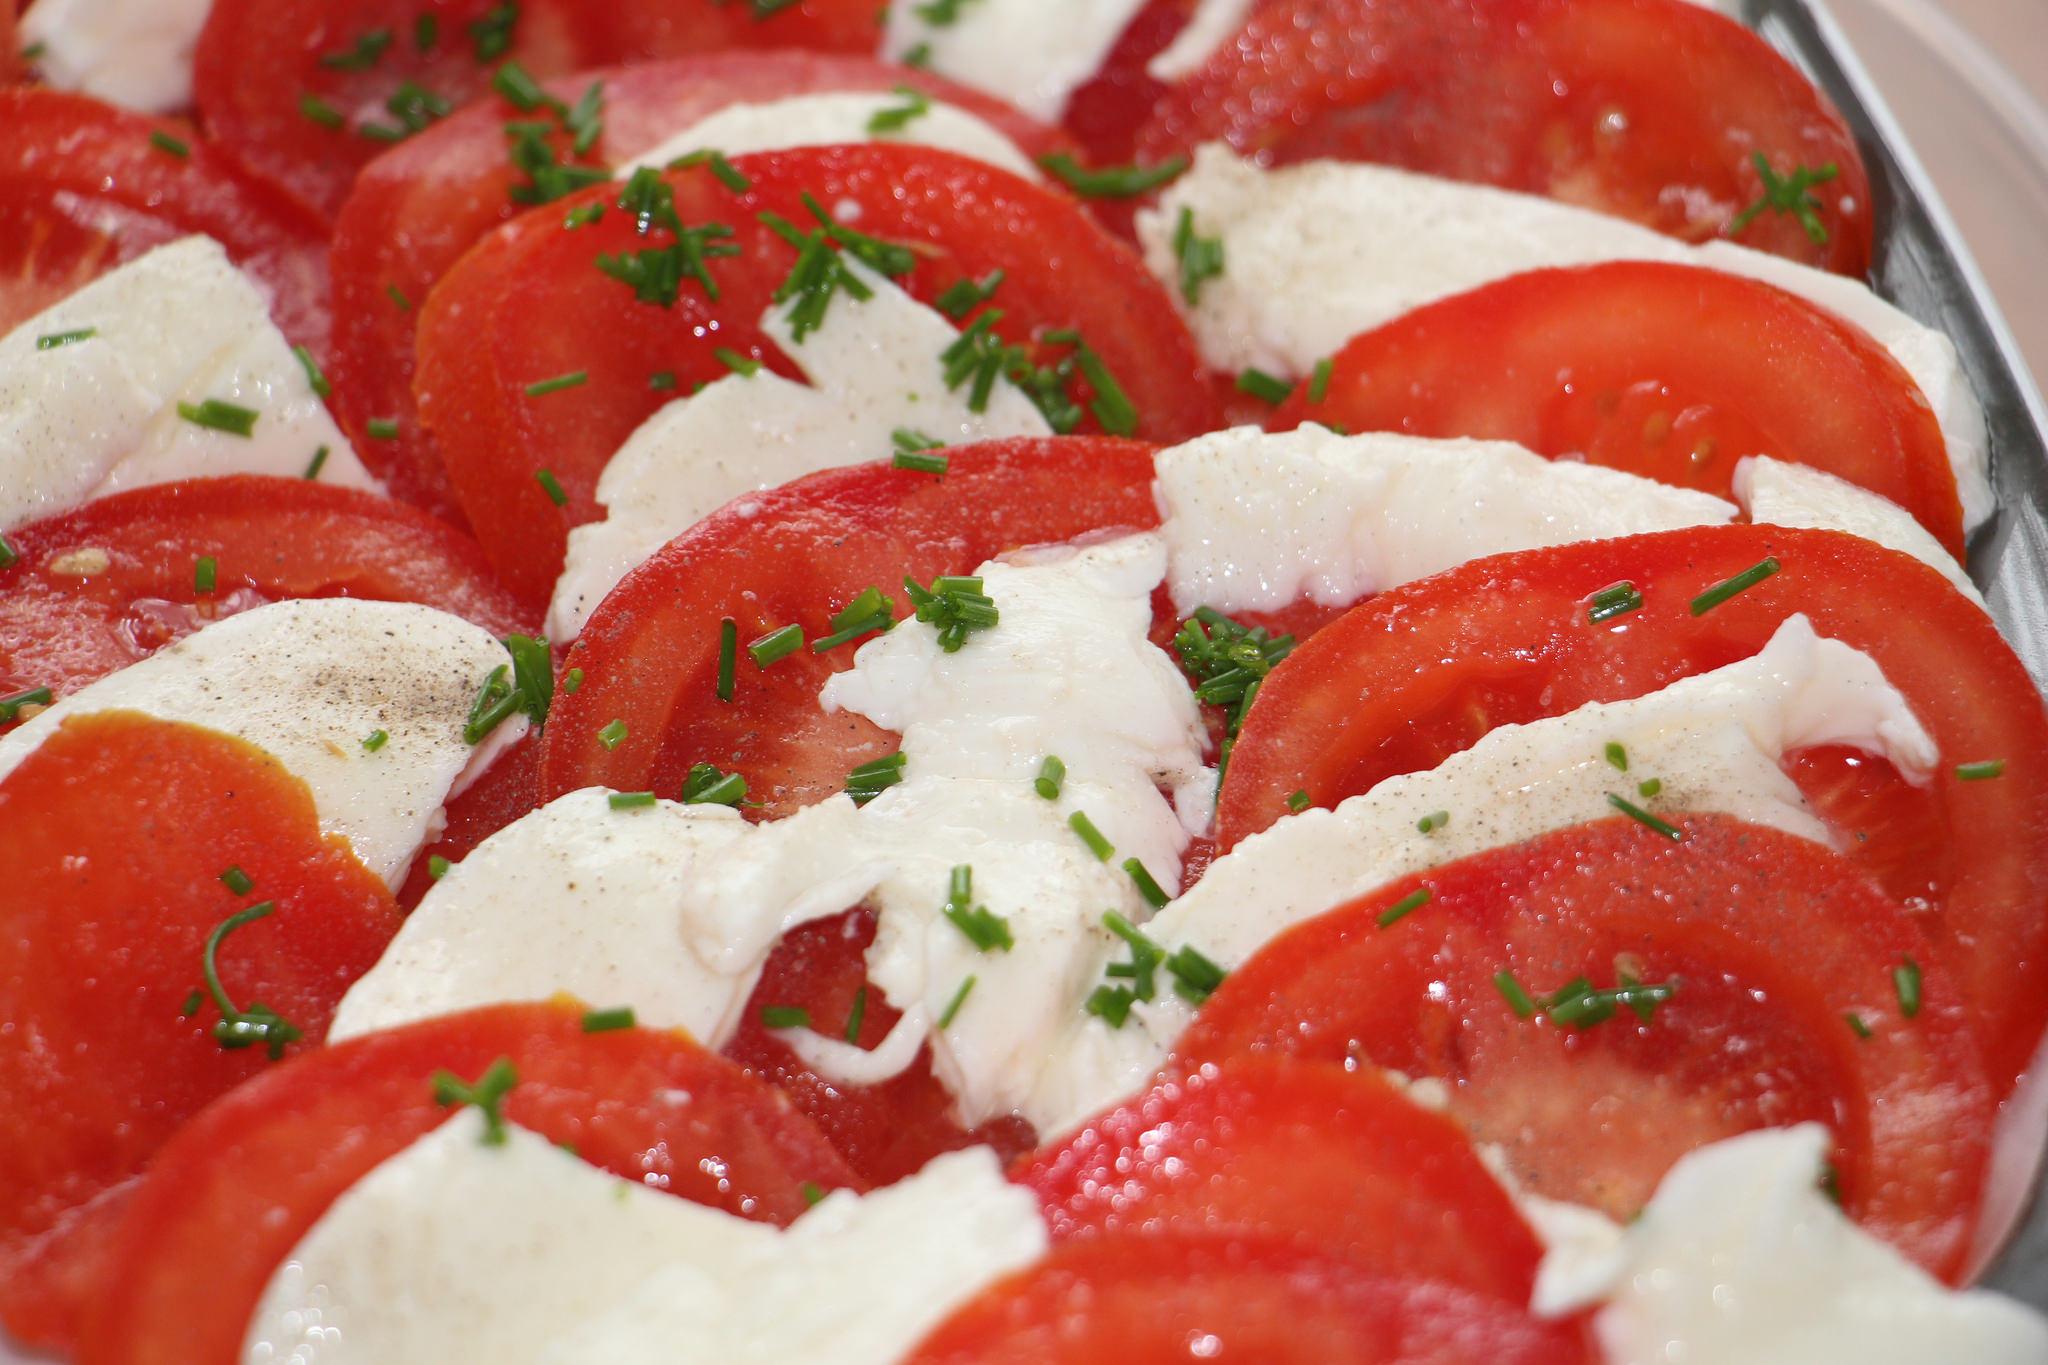 leil.de/di/pics/tomate-mozzarella-salat.jpg